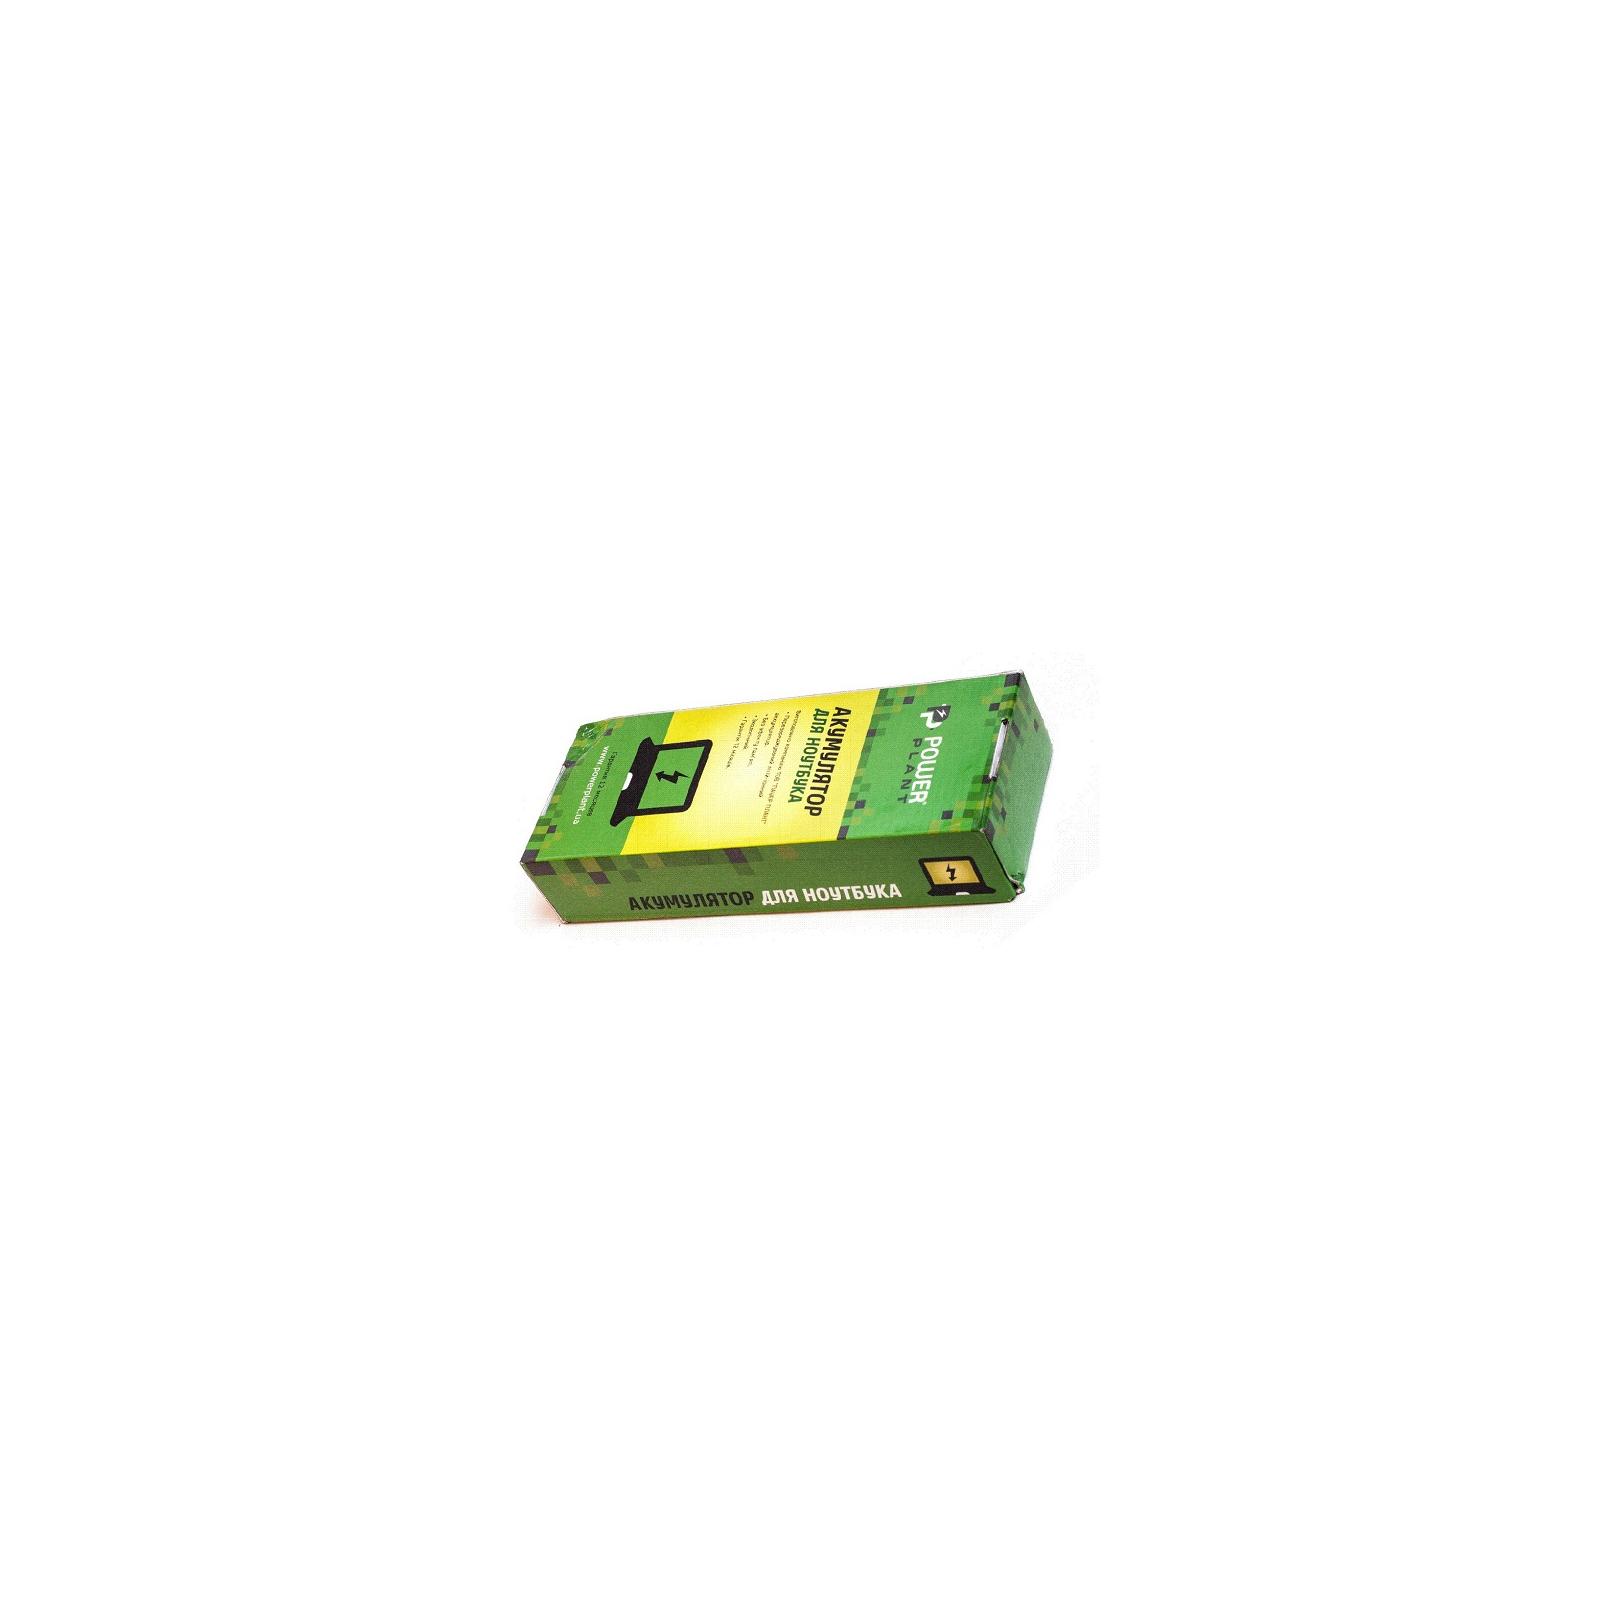 Аккумулятор для ноутбука DELL Latitude E6400 (NM633, DE E6400 3SP2) 11.1V 5200mAh PowerPlant (NB00000111) изображение 3